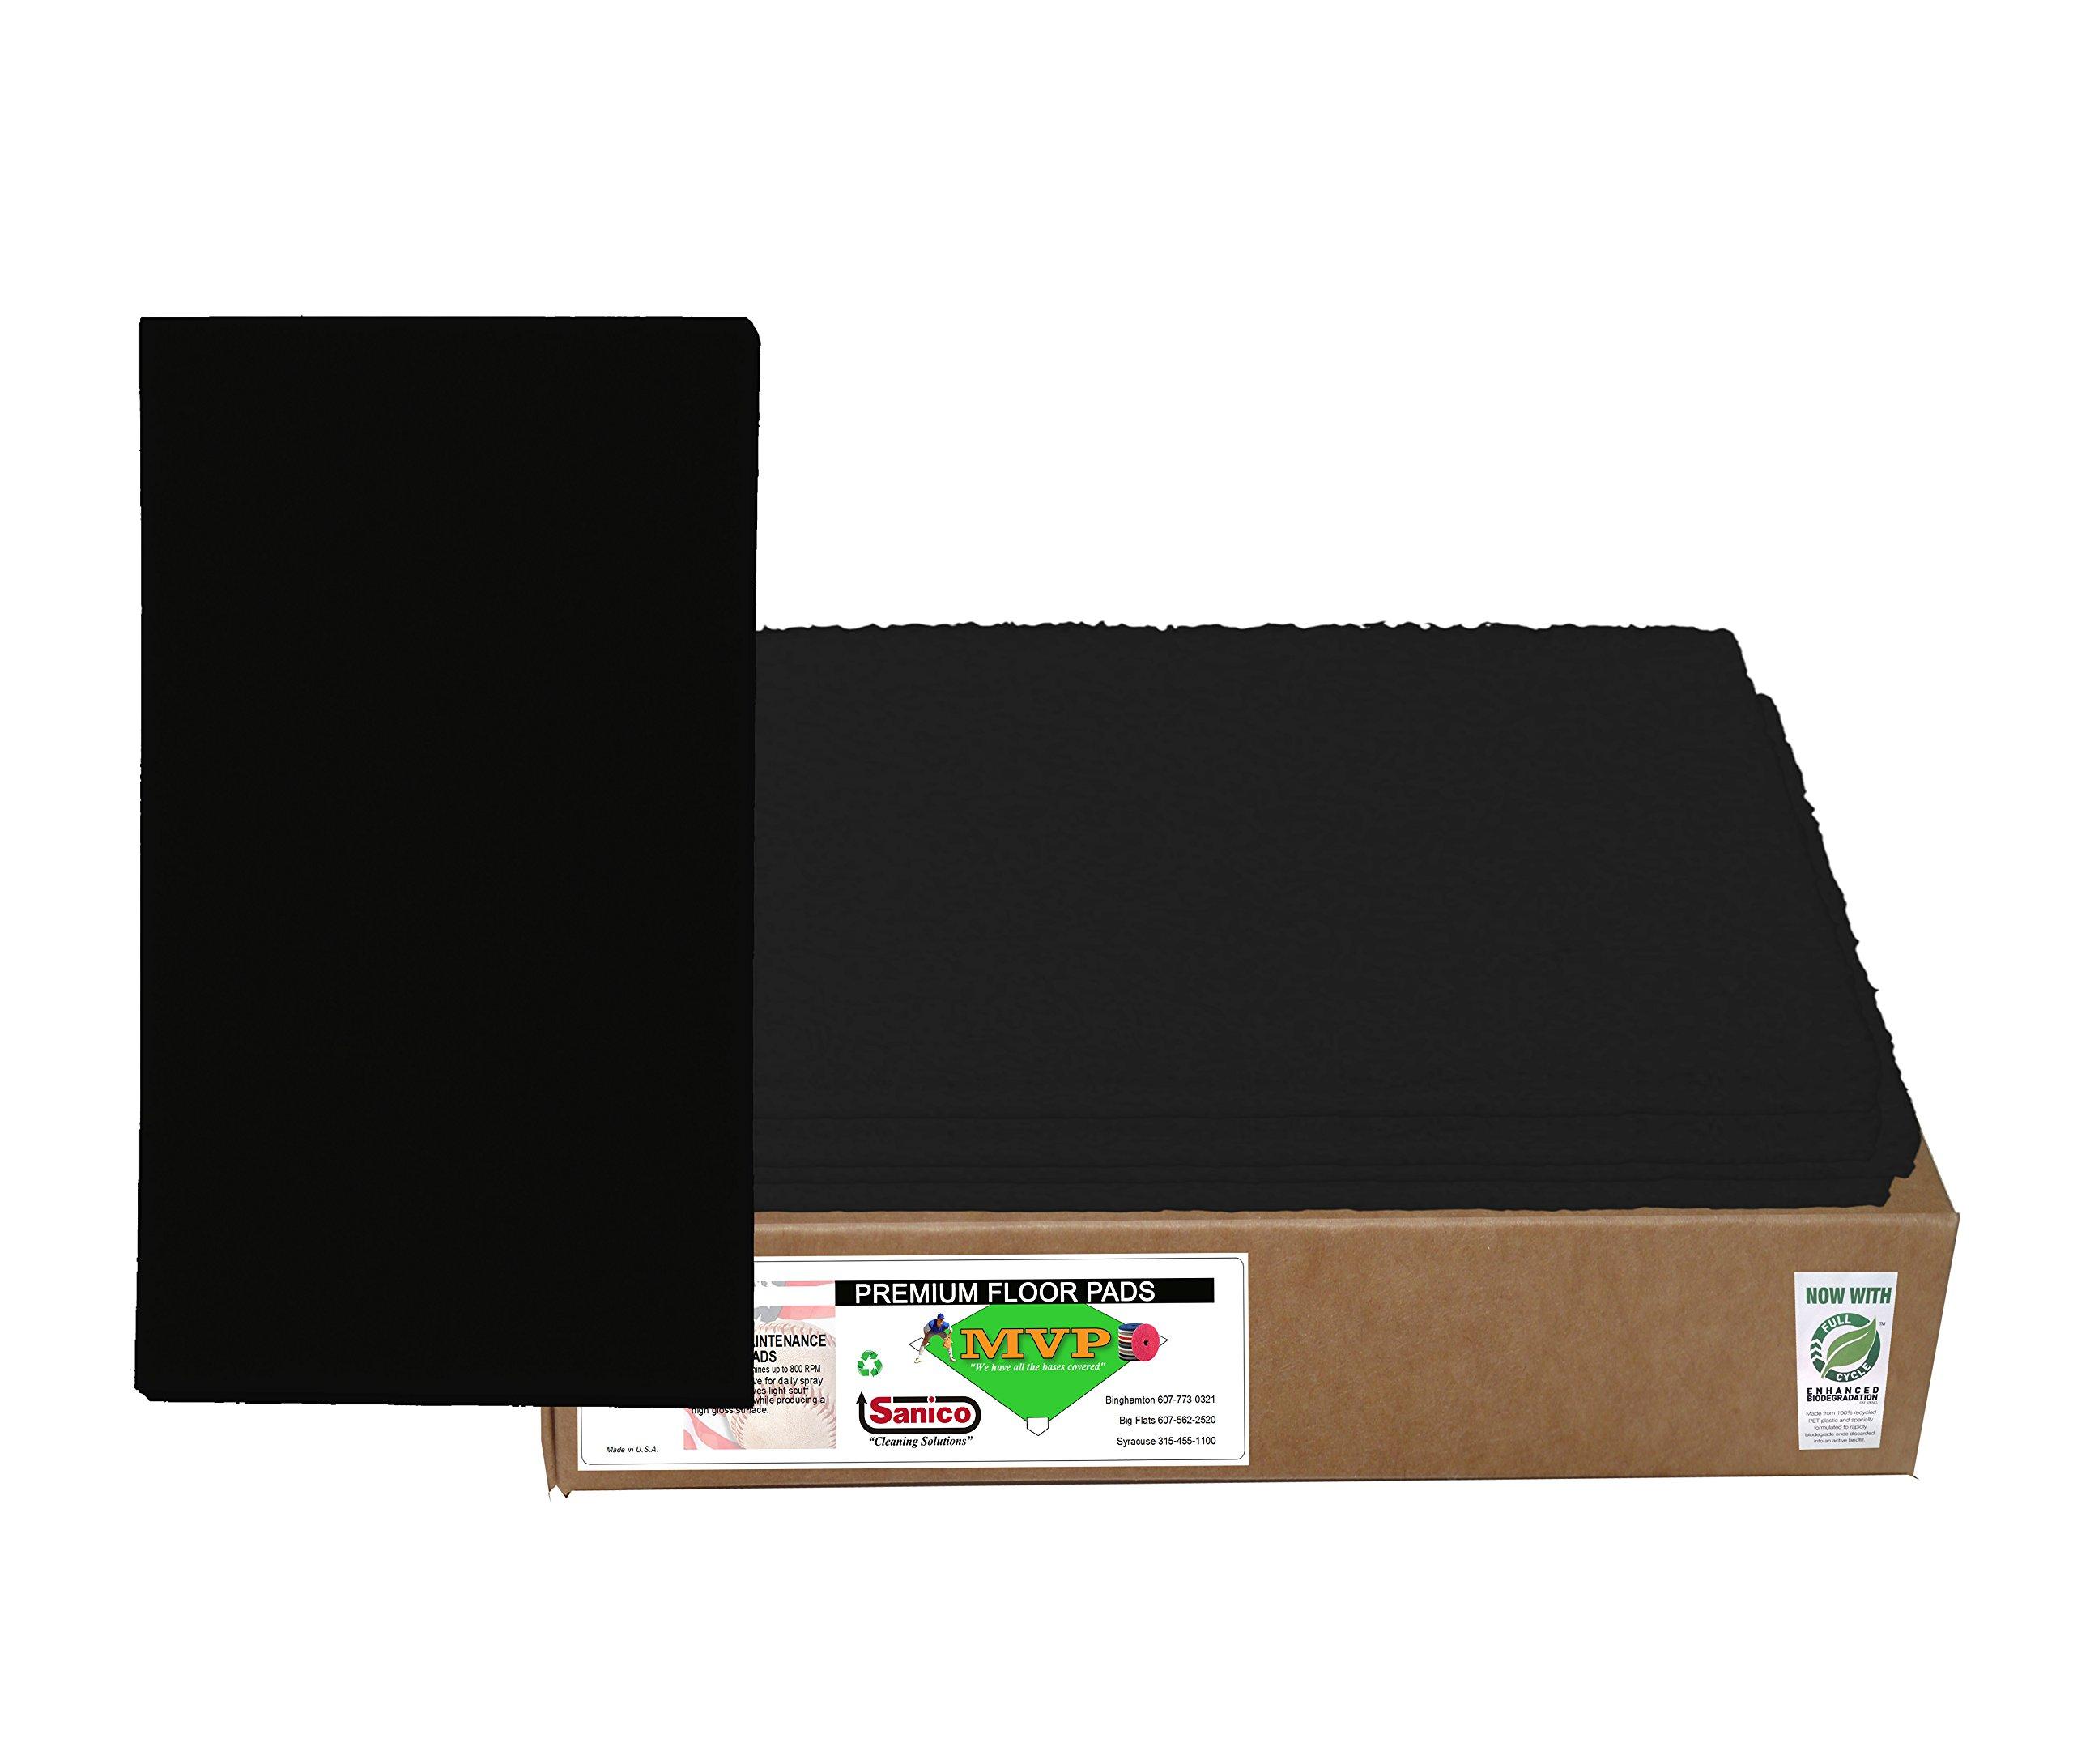 Sanico MVP Reliever 14'' x 28'' Black Stripping Floor Pad Wet Strip (5 per case) -(1 CASE) by Sanico